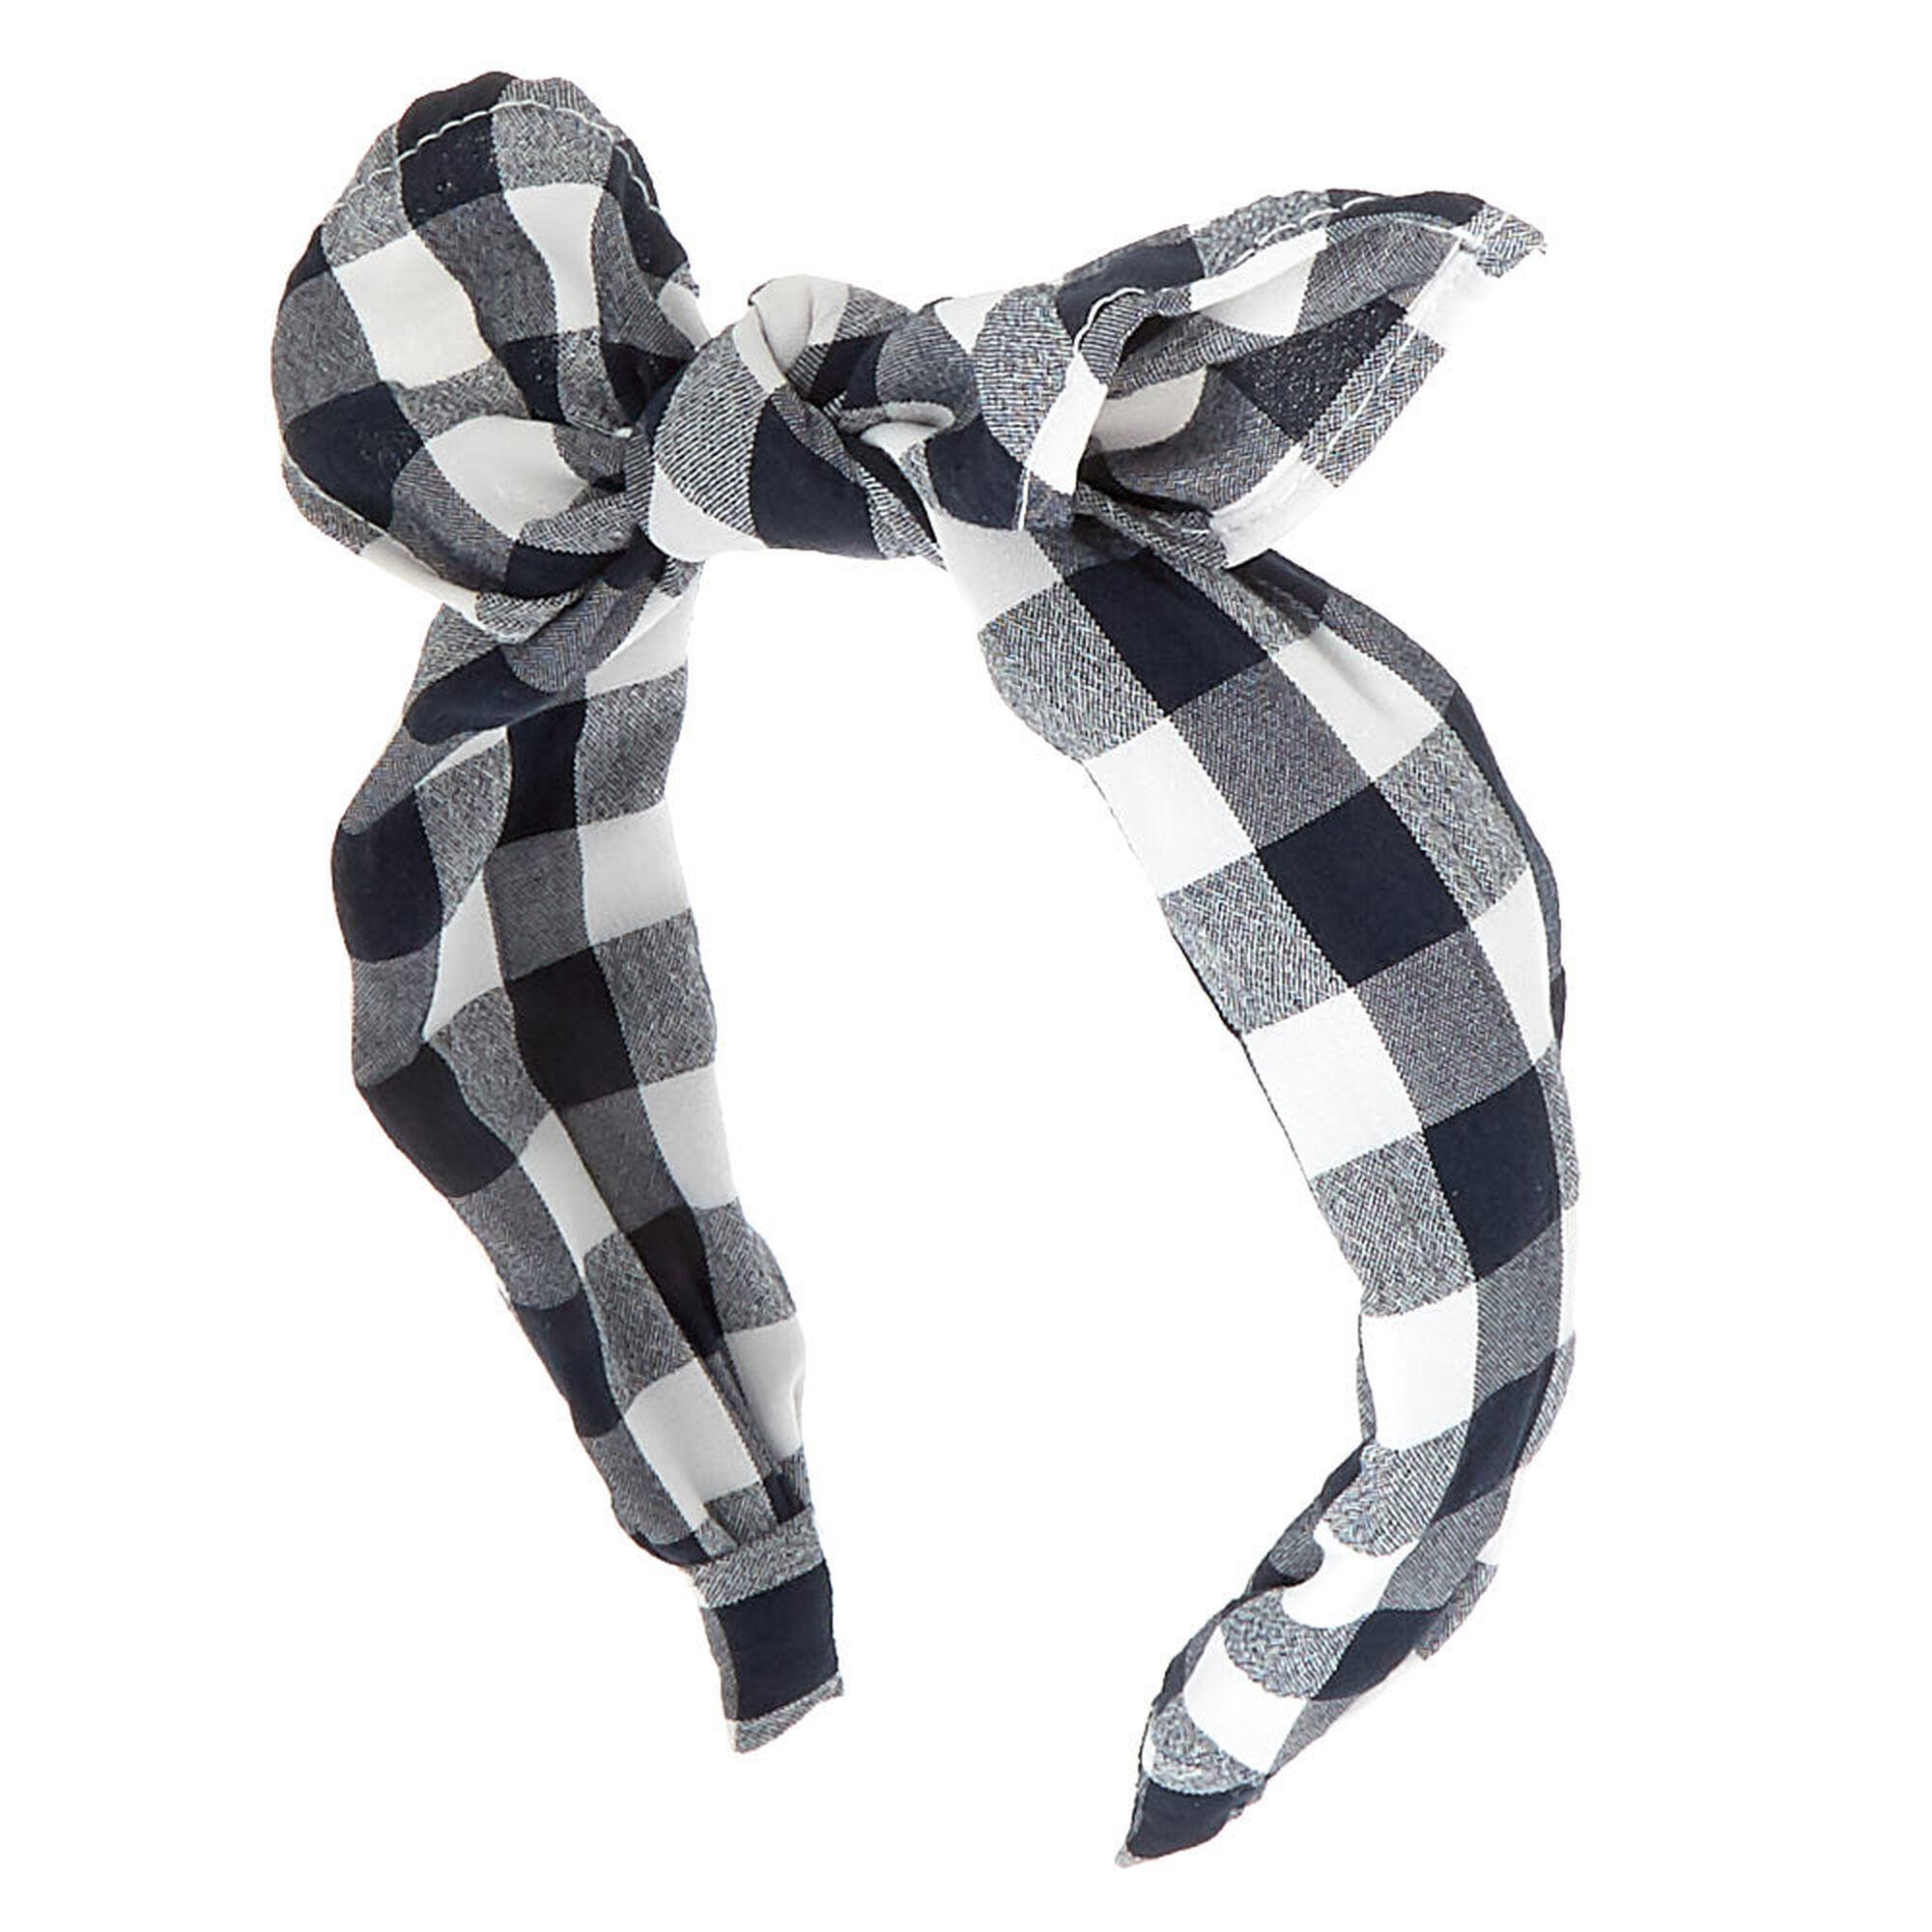 b3724b86b76eb Gingham Knot Bow Headband - Black